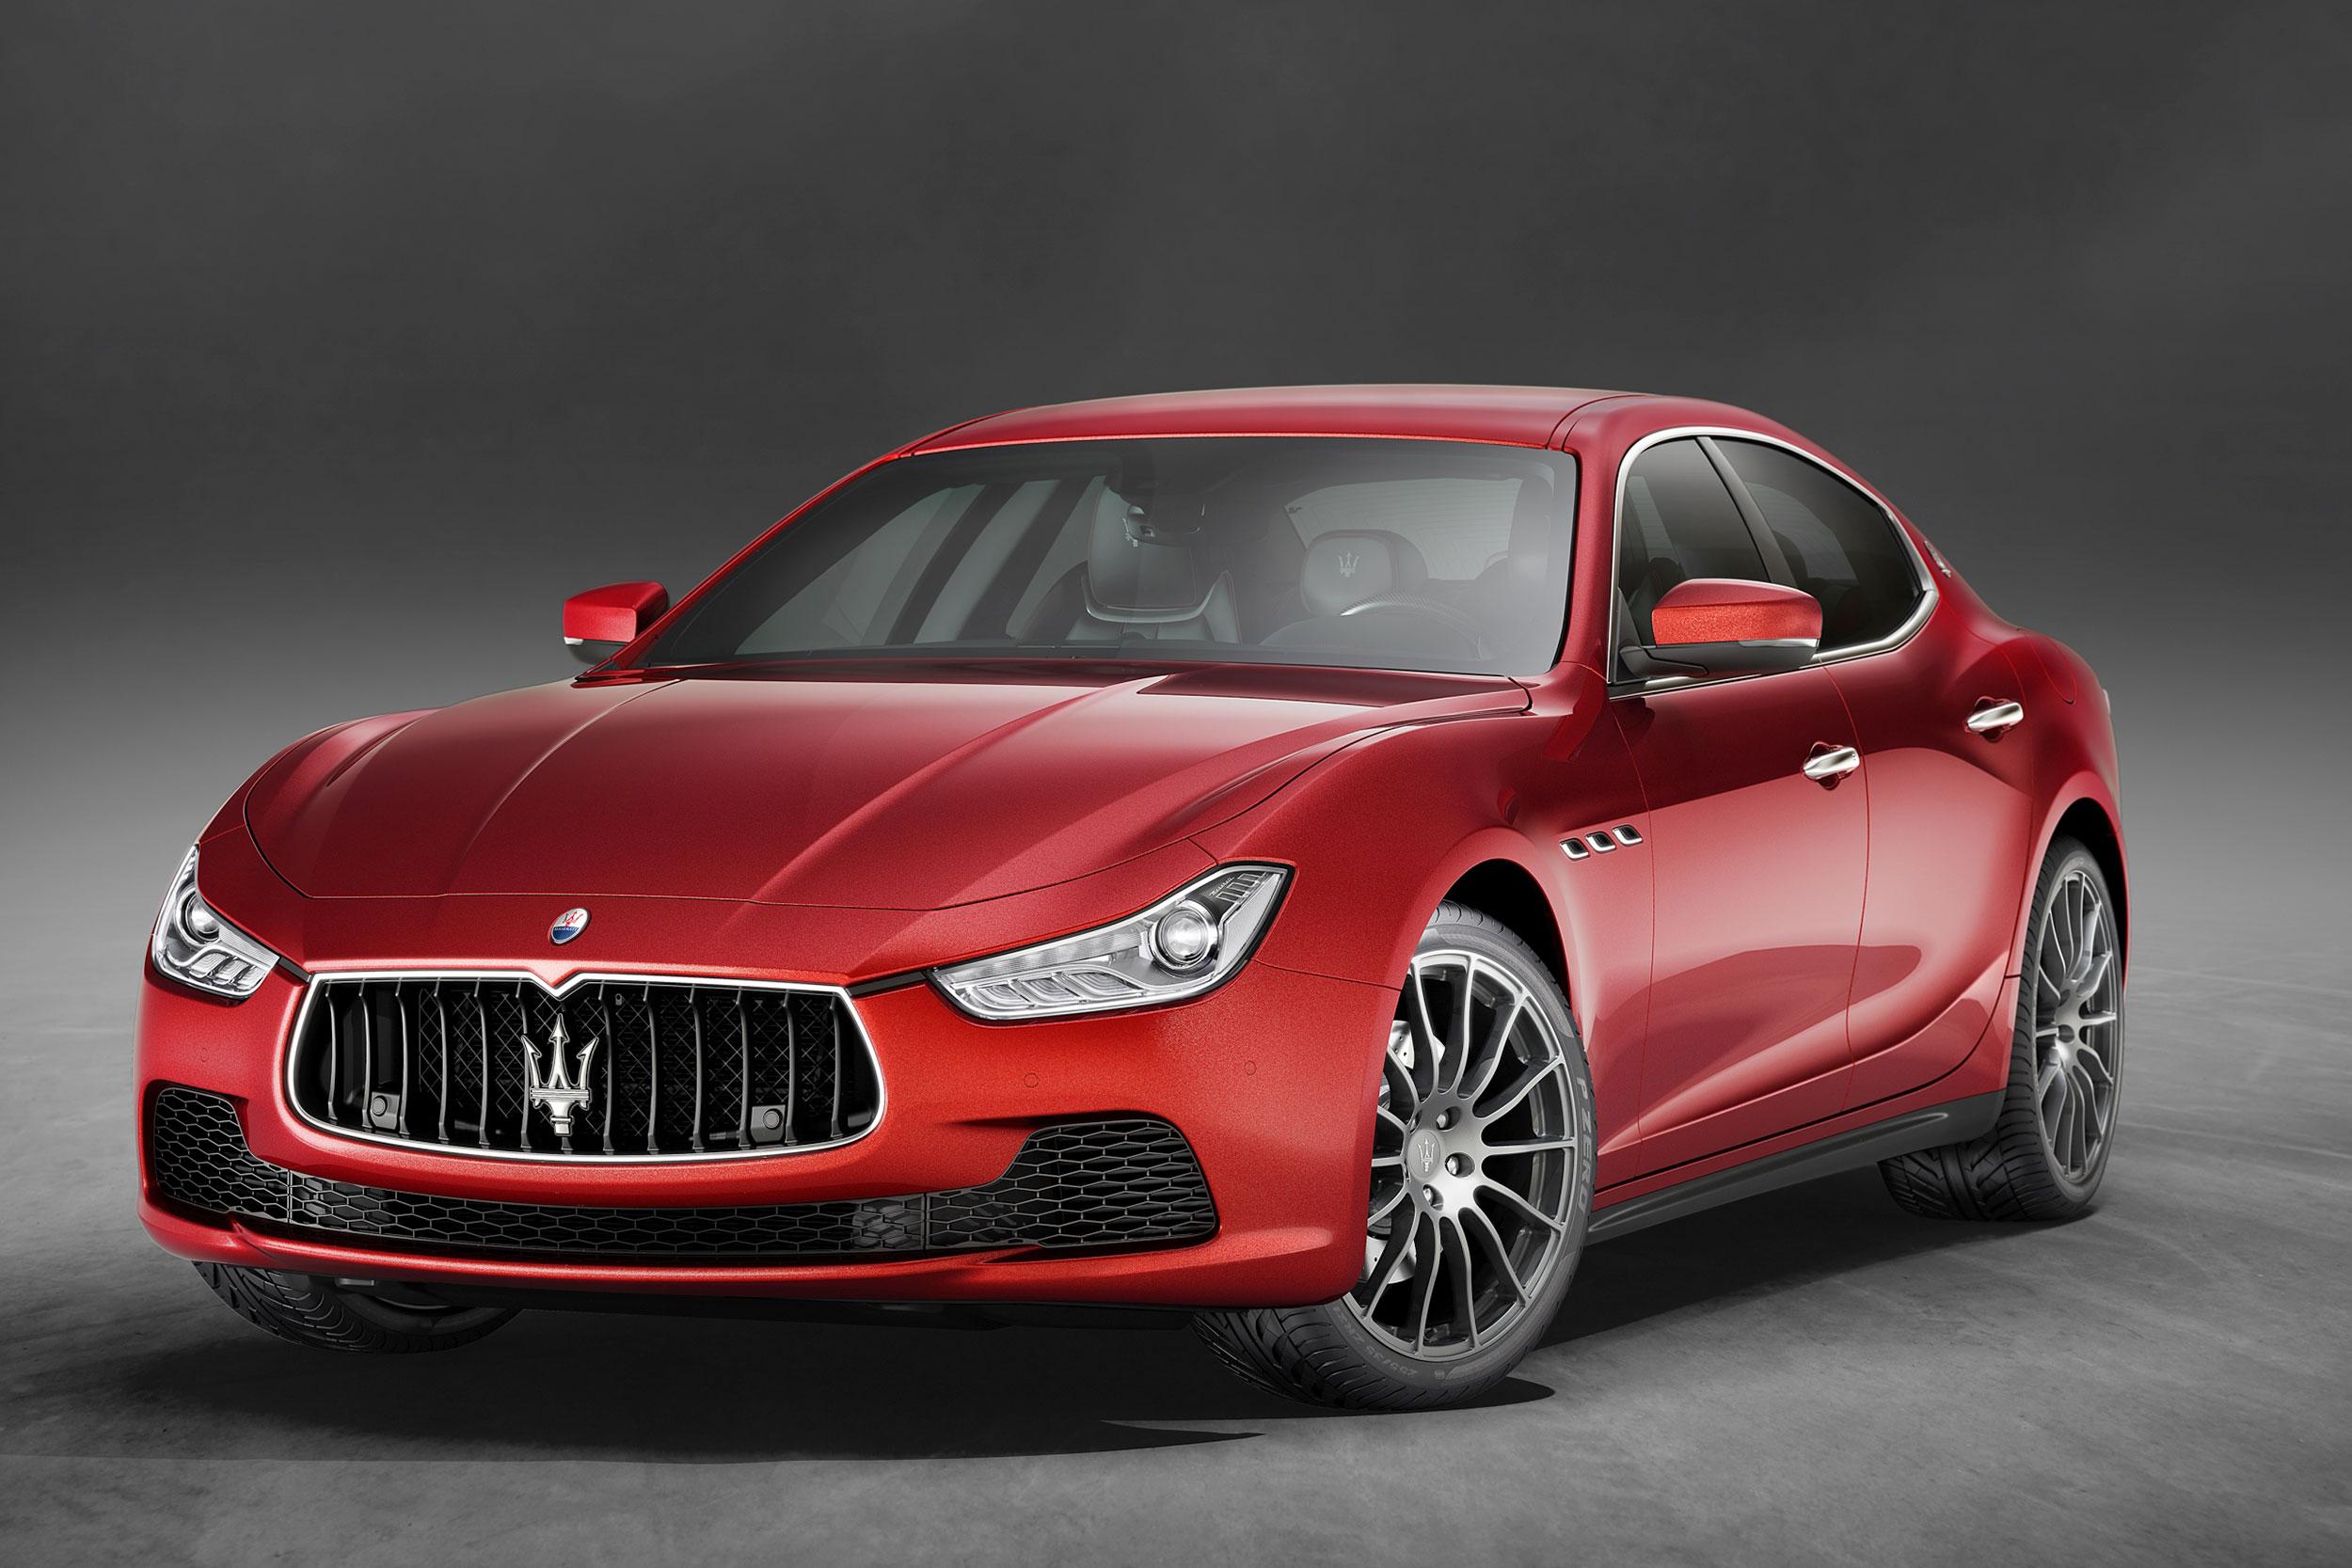 Maserati GHIBLI S Q4 2017 International Price & Overview